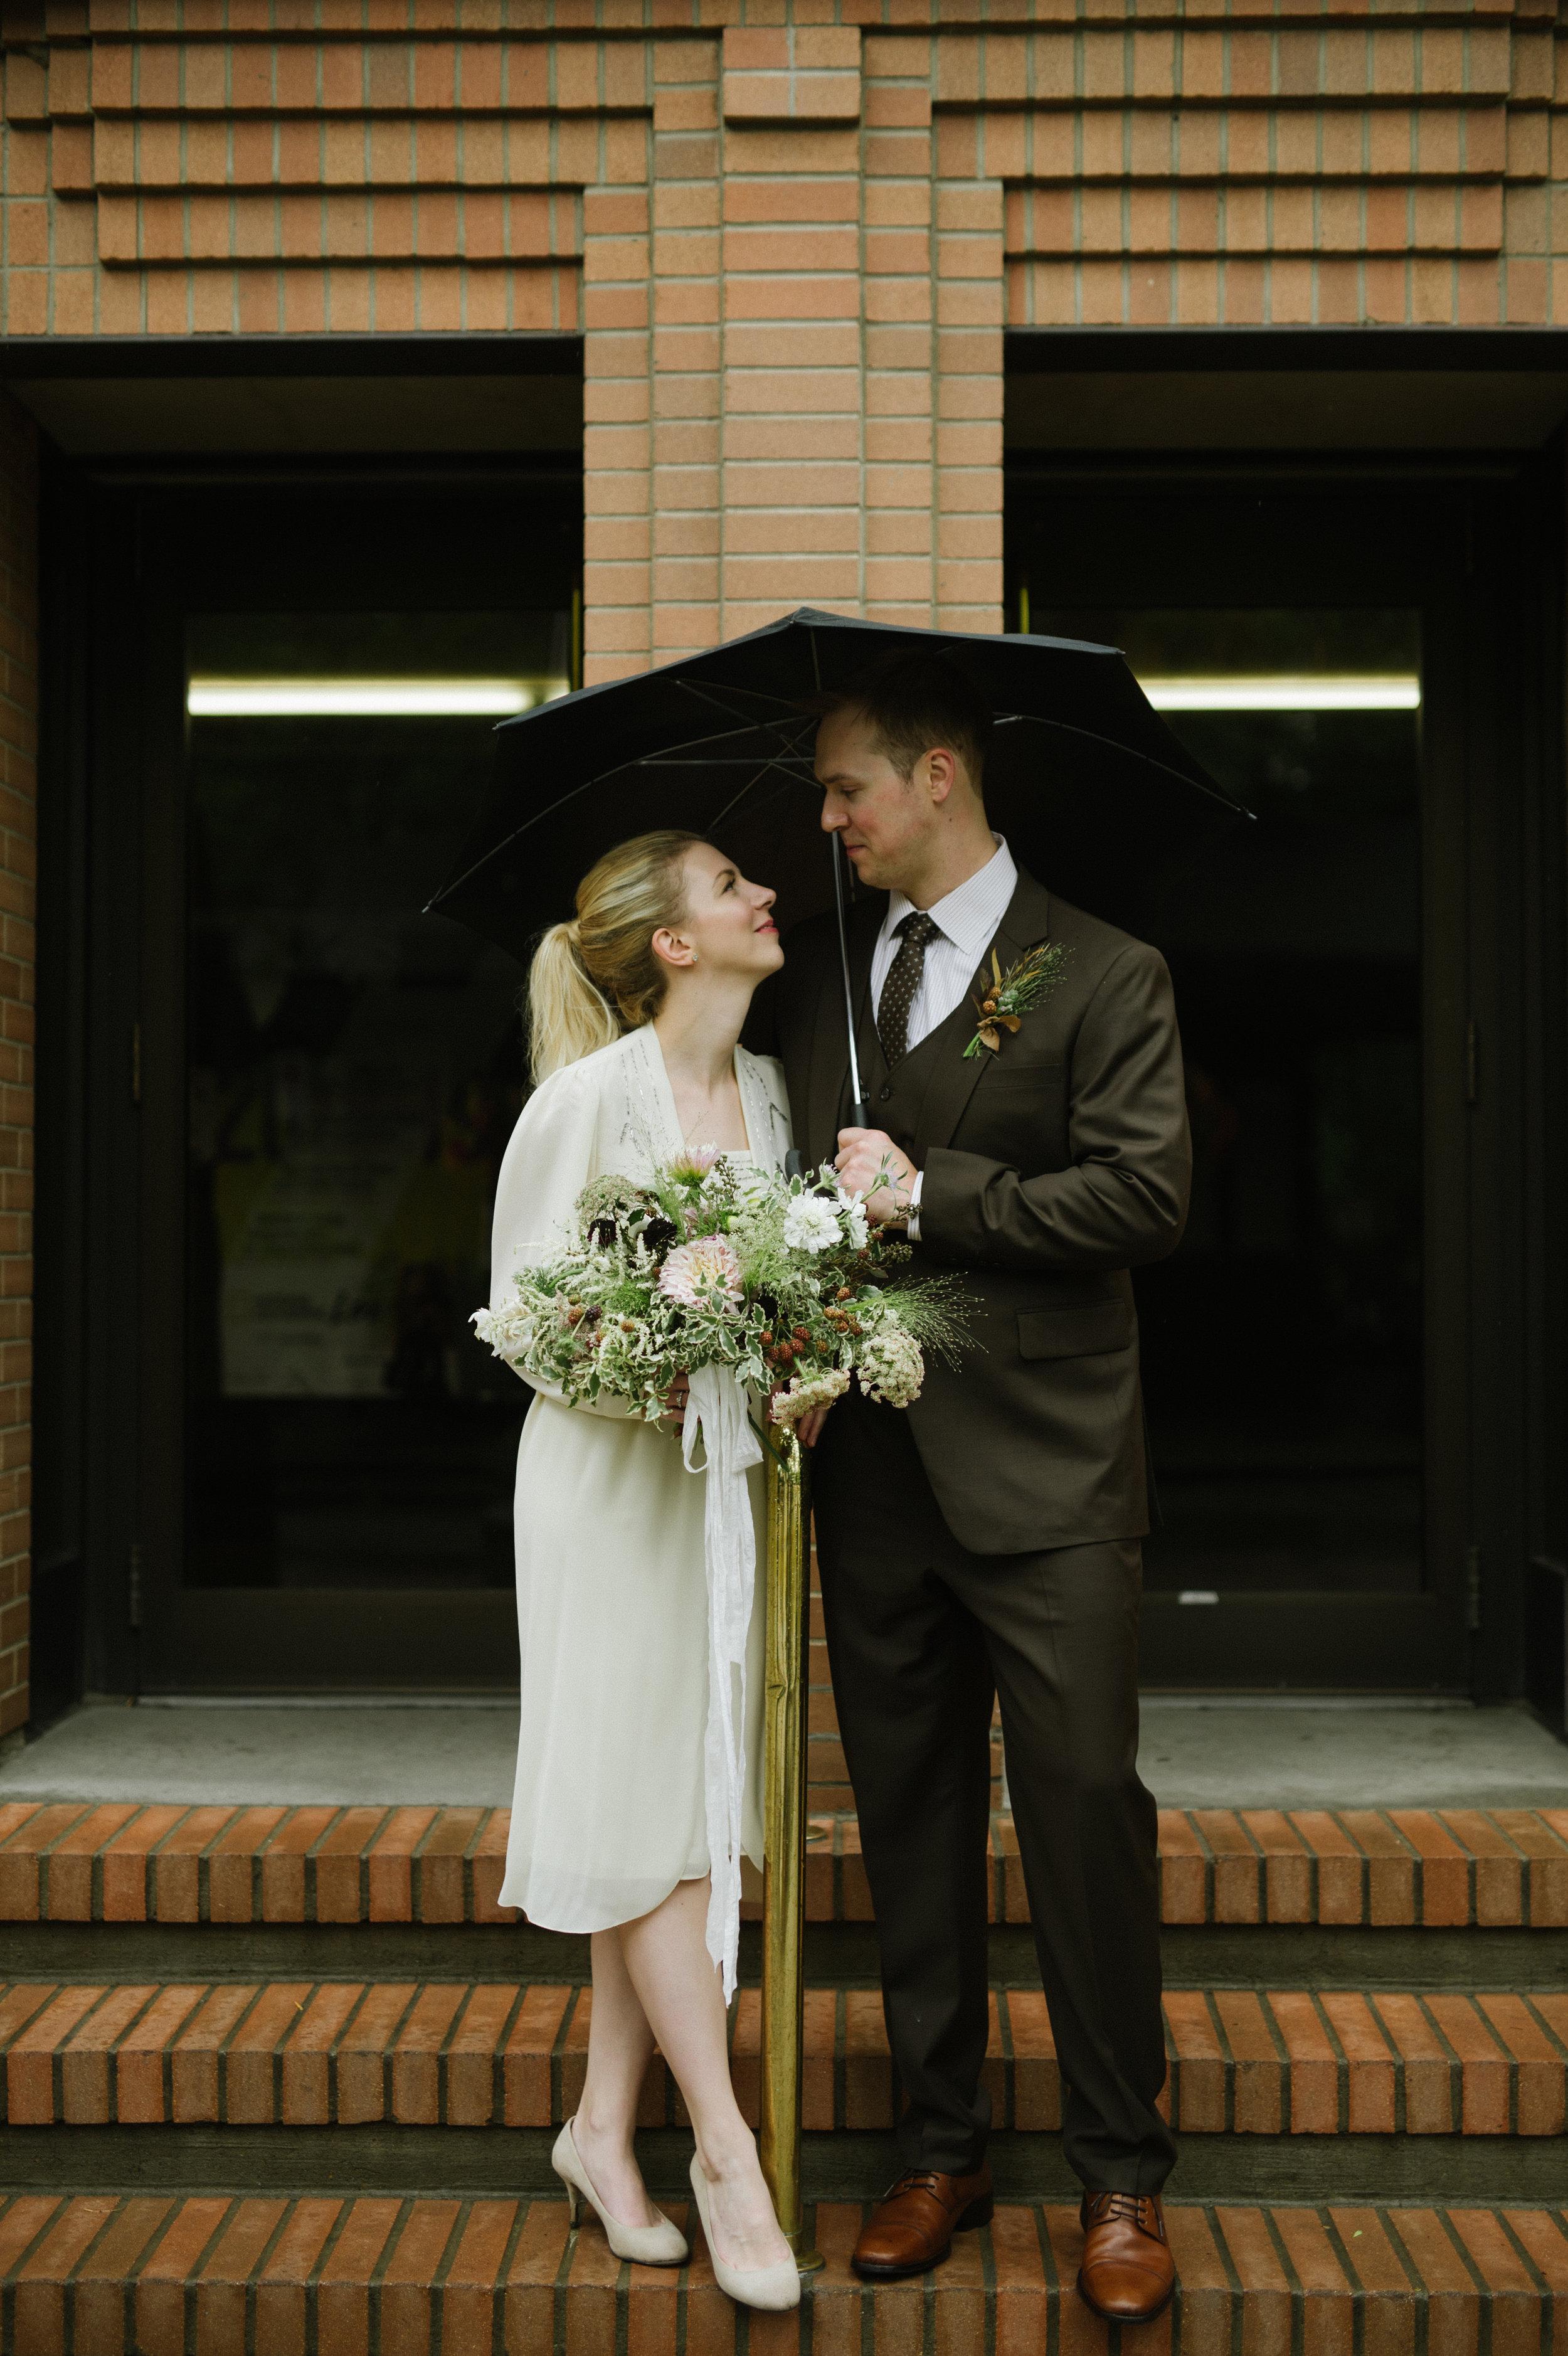 Teatro_Wedding_Calgary_Wedding_Photography_Vanessa_Tom_Married_2018_HR008.jpg